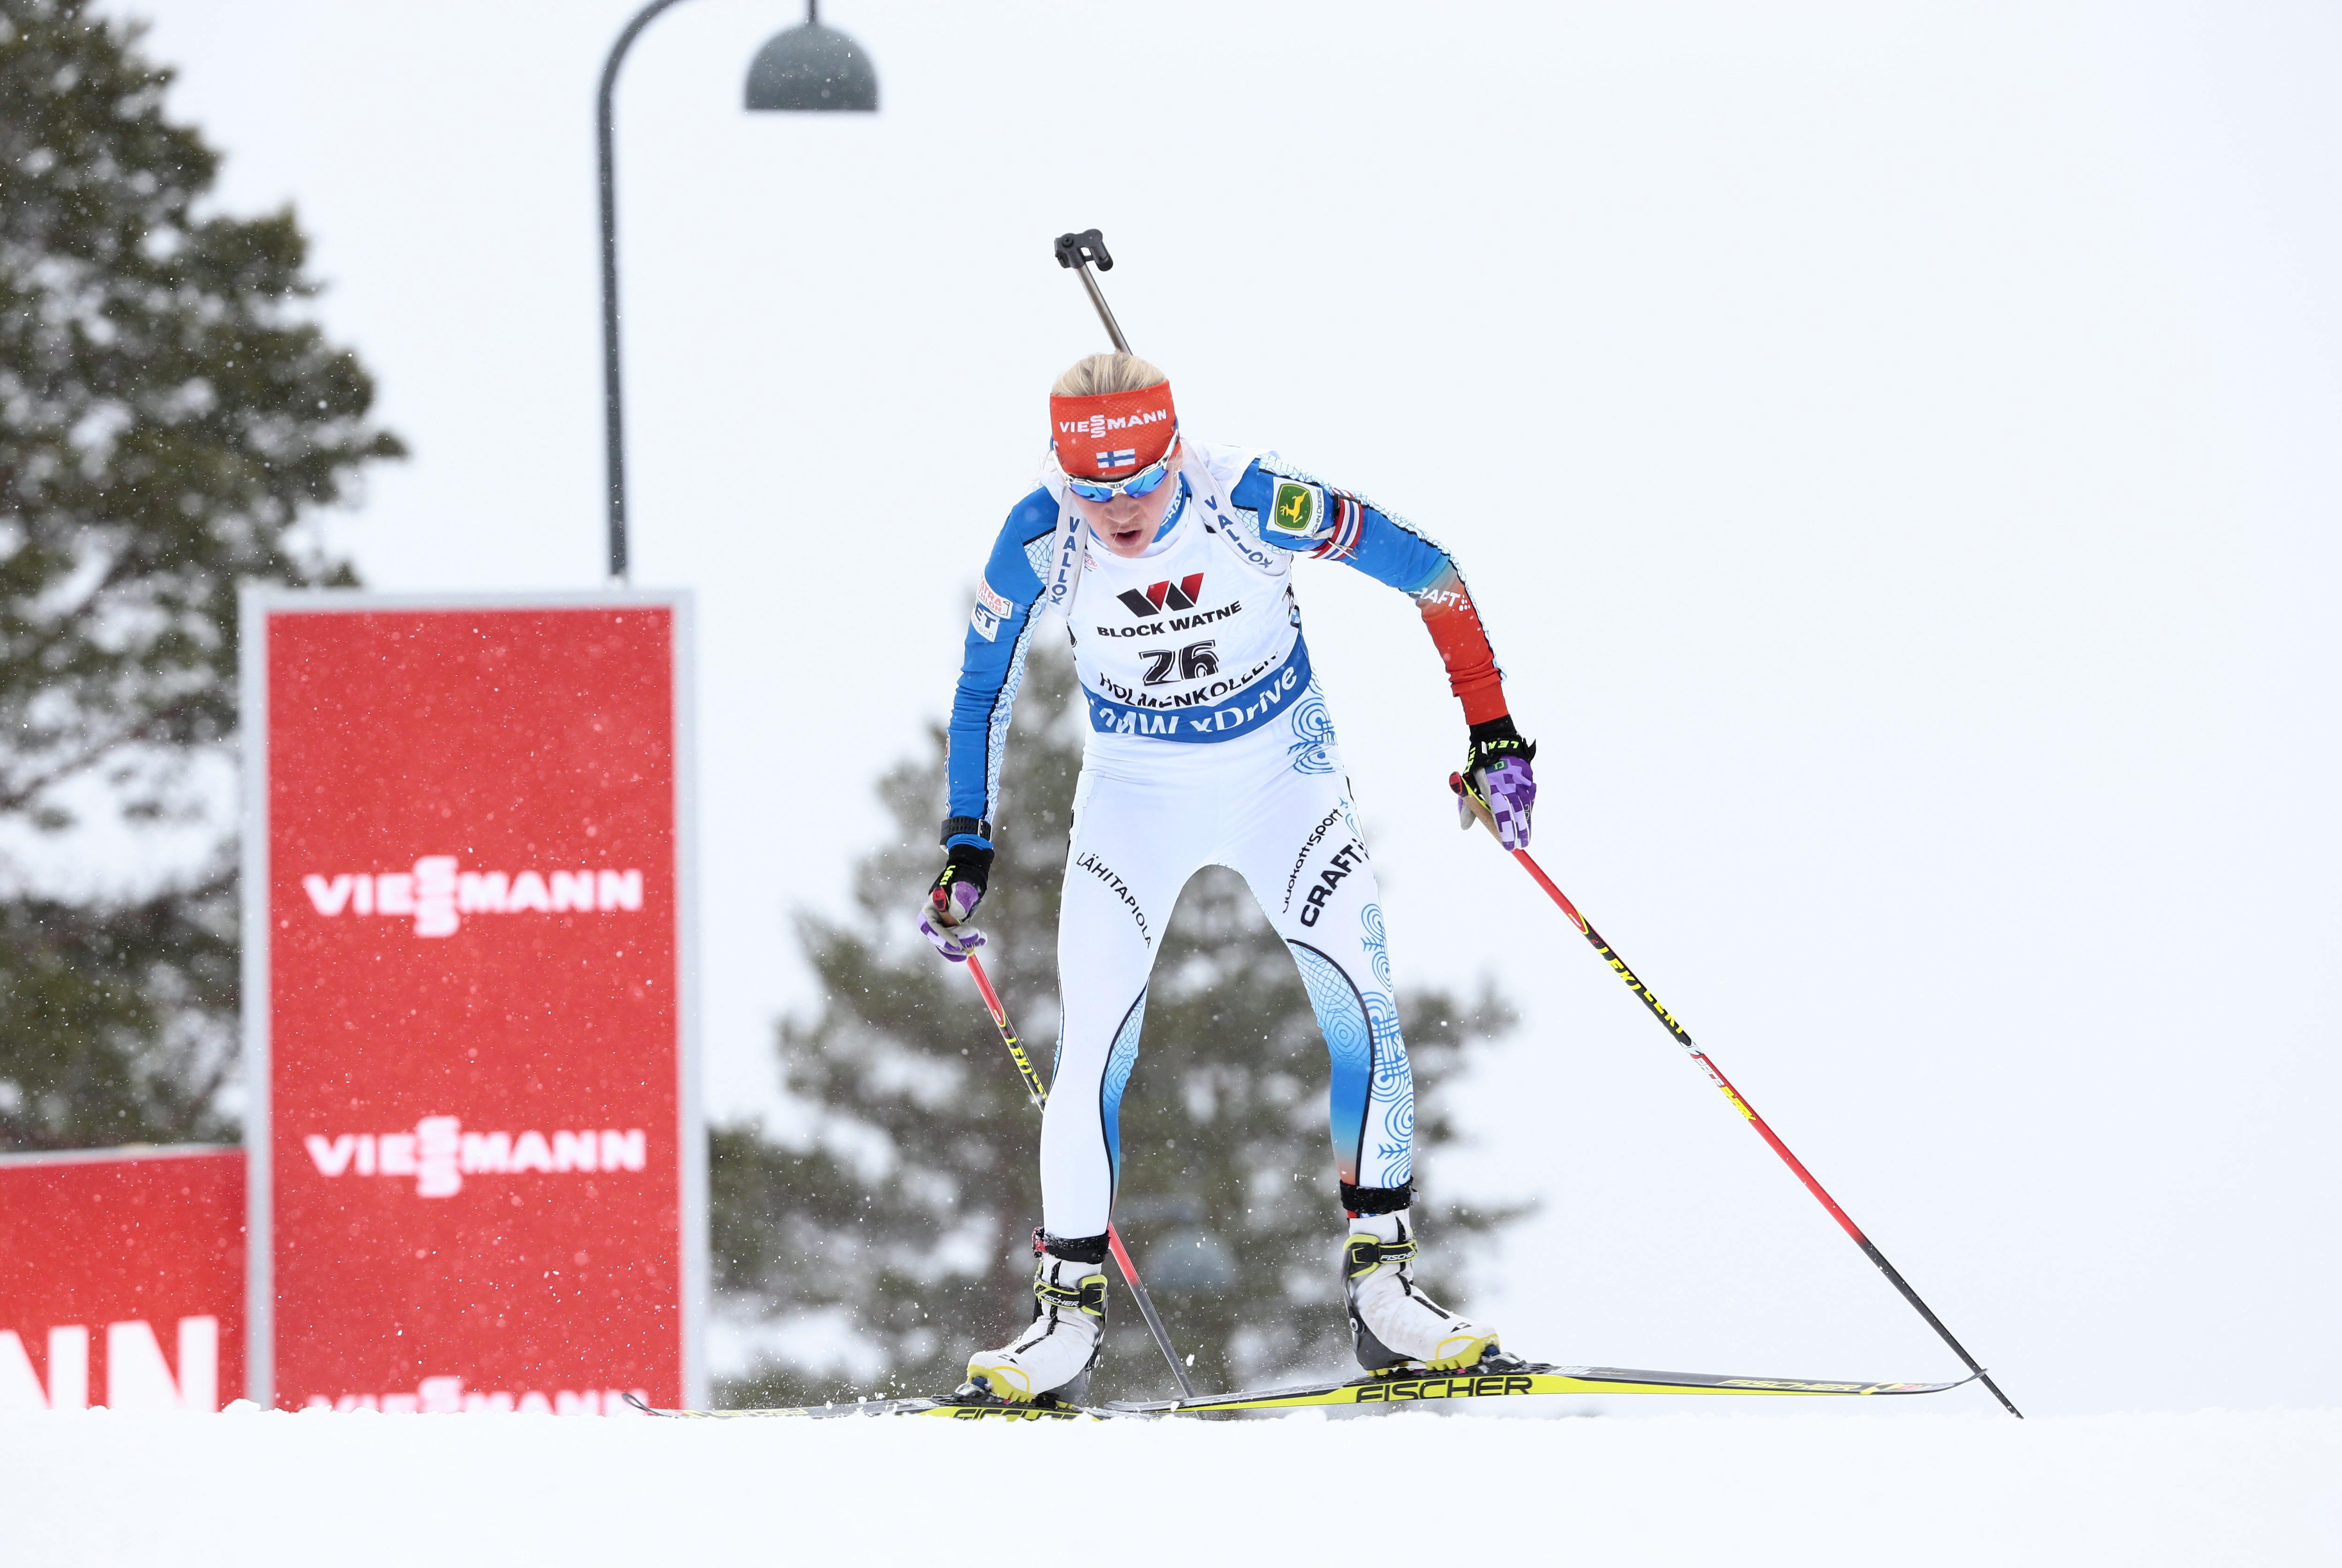 britain_biathlon_world_championships-6b7_r9707.jpeg